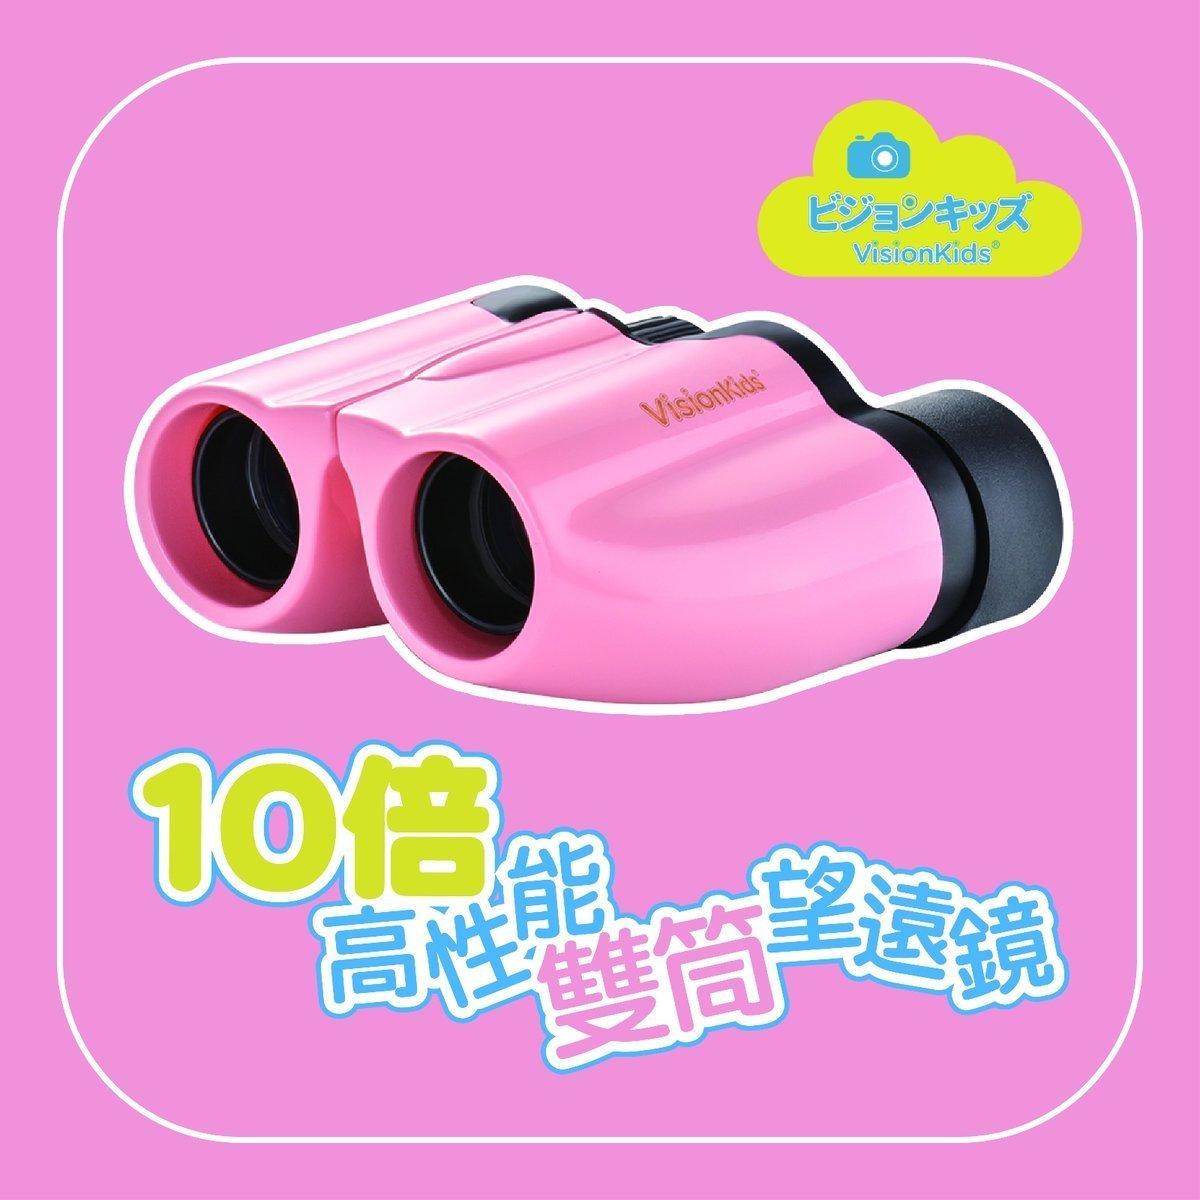 VisionKids - Binoculars 10x